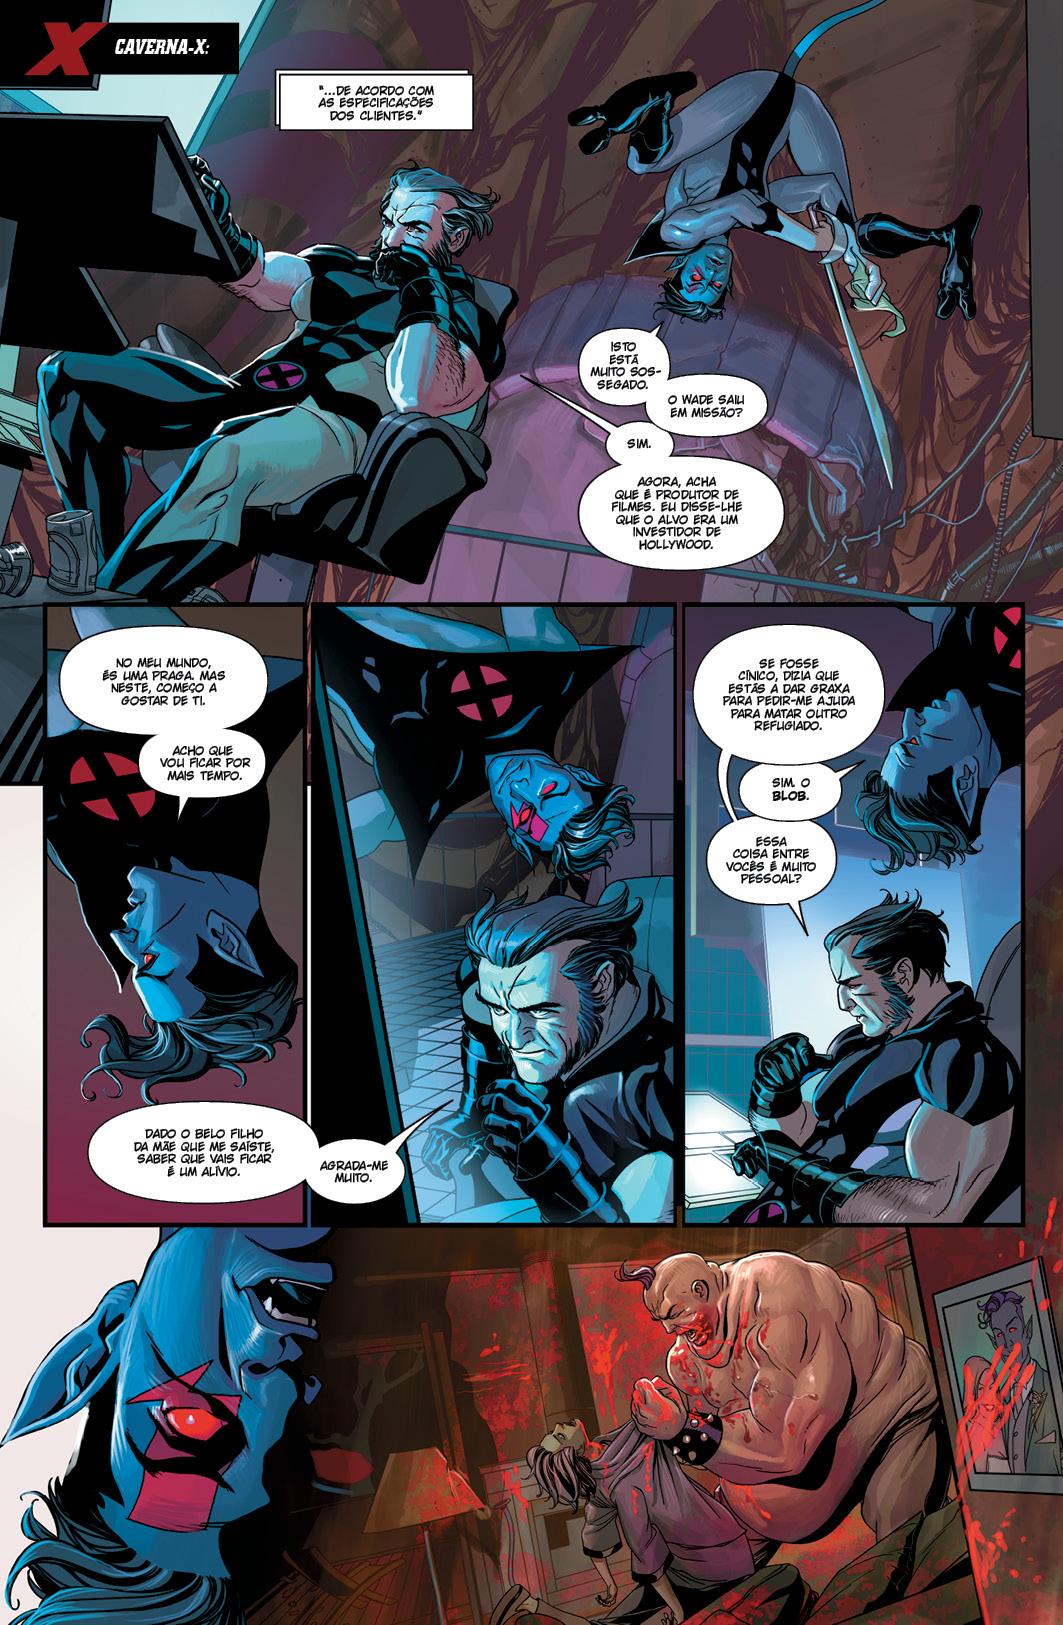 UNCANNY X-FORCE Vol. 4: EXECUÇÃO FINAL